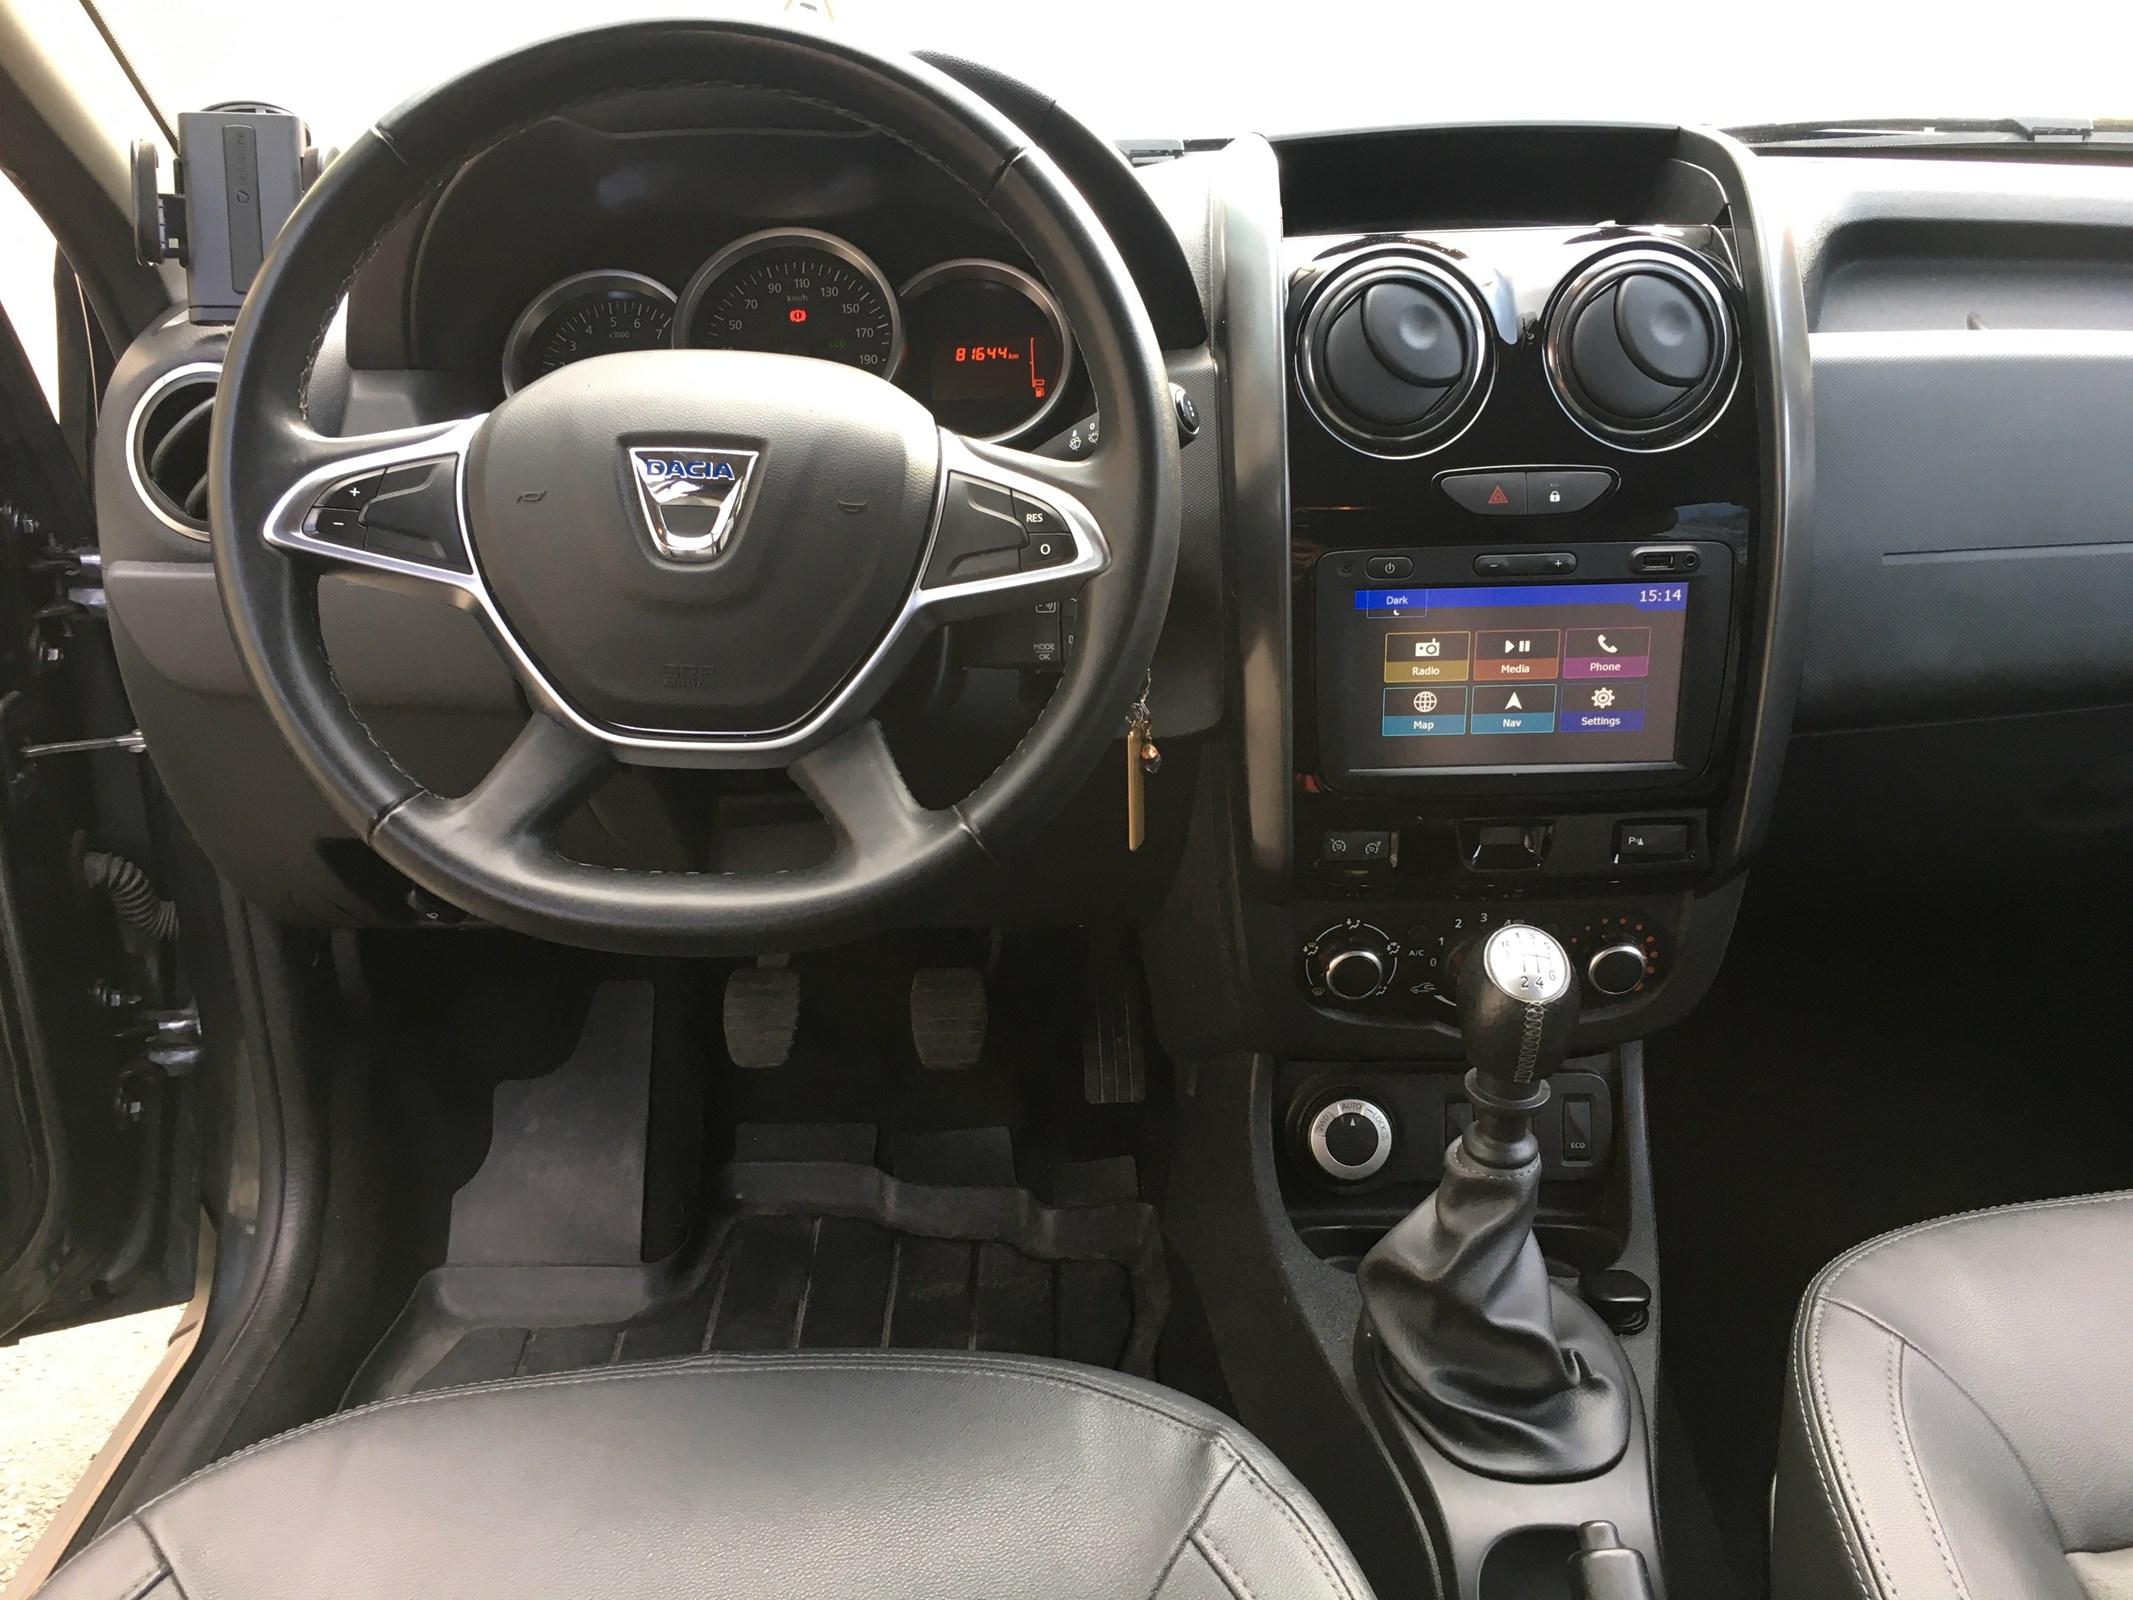 Dacia Duster 1.5 dCi FmF Strongm.R 4x4 S/S